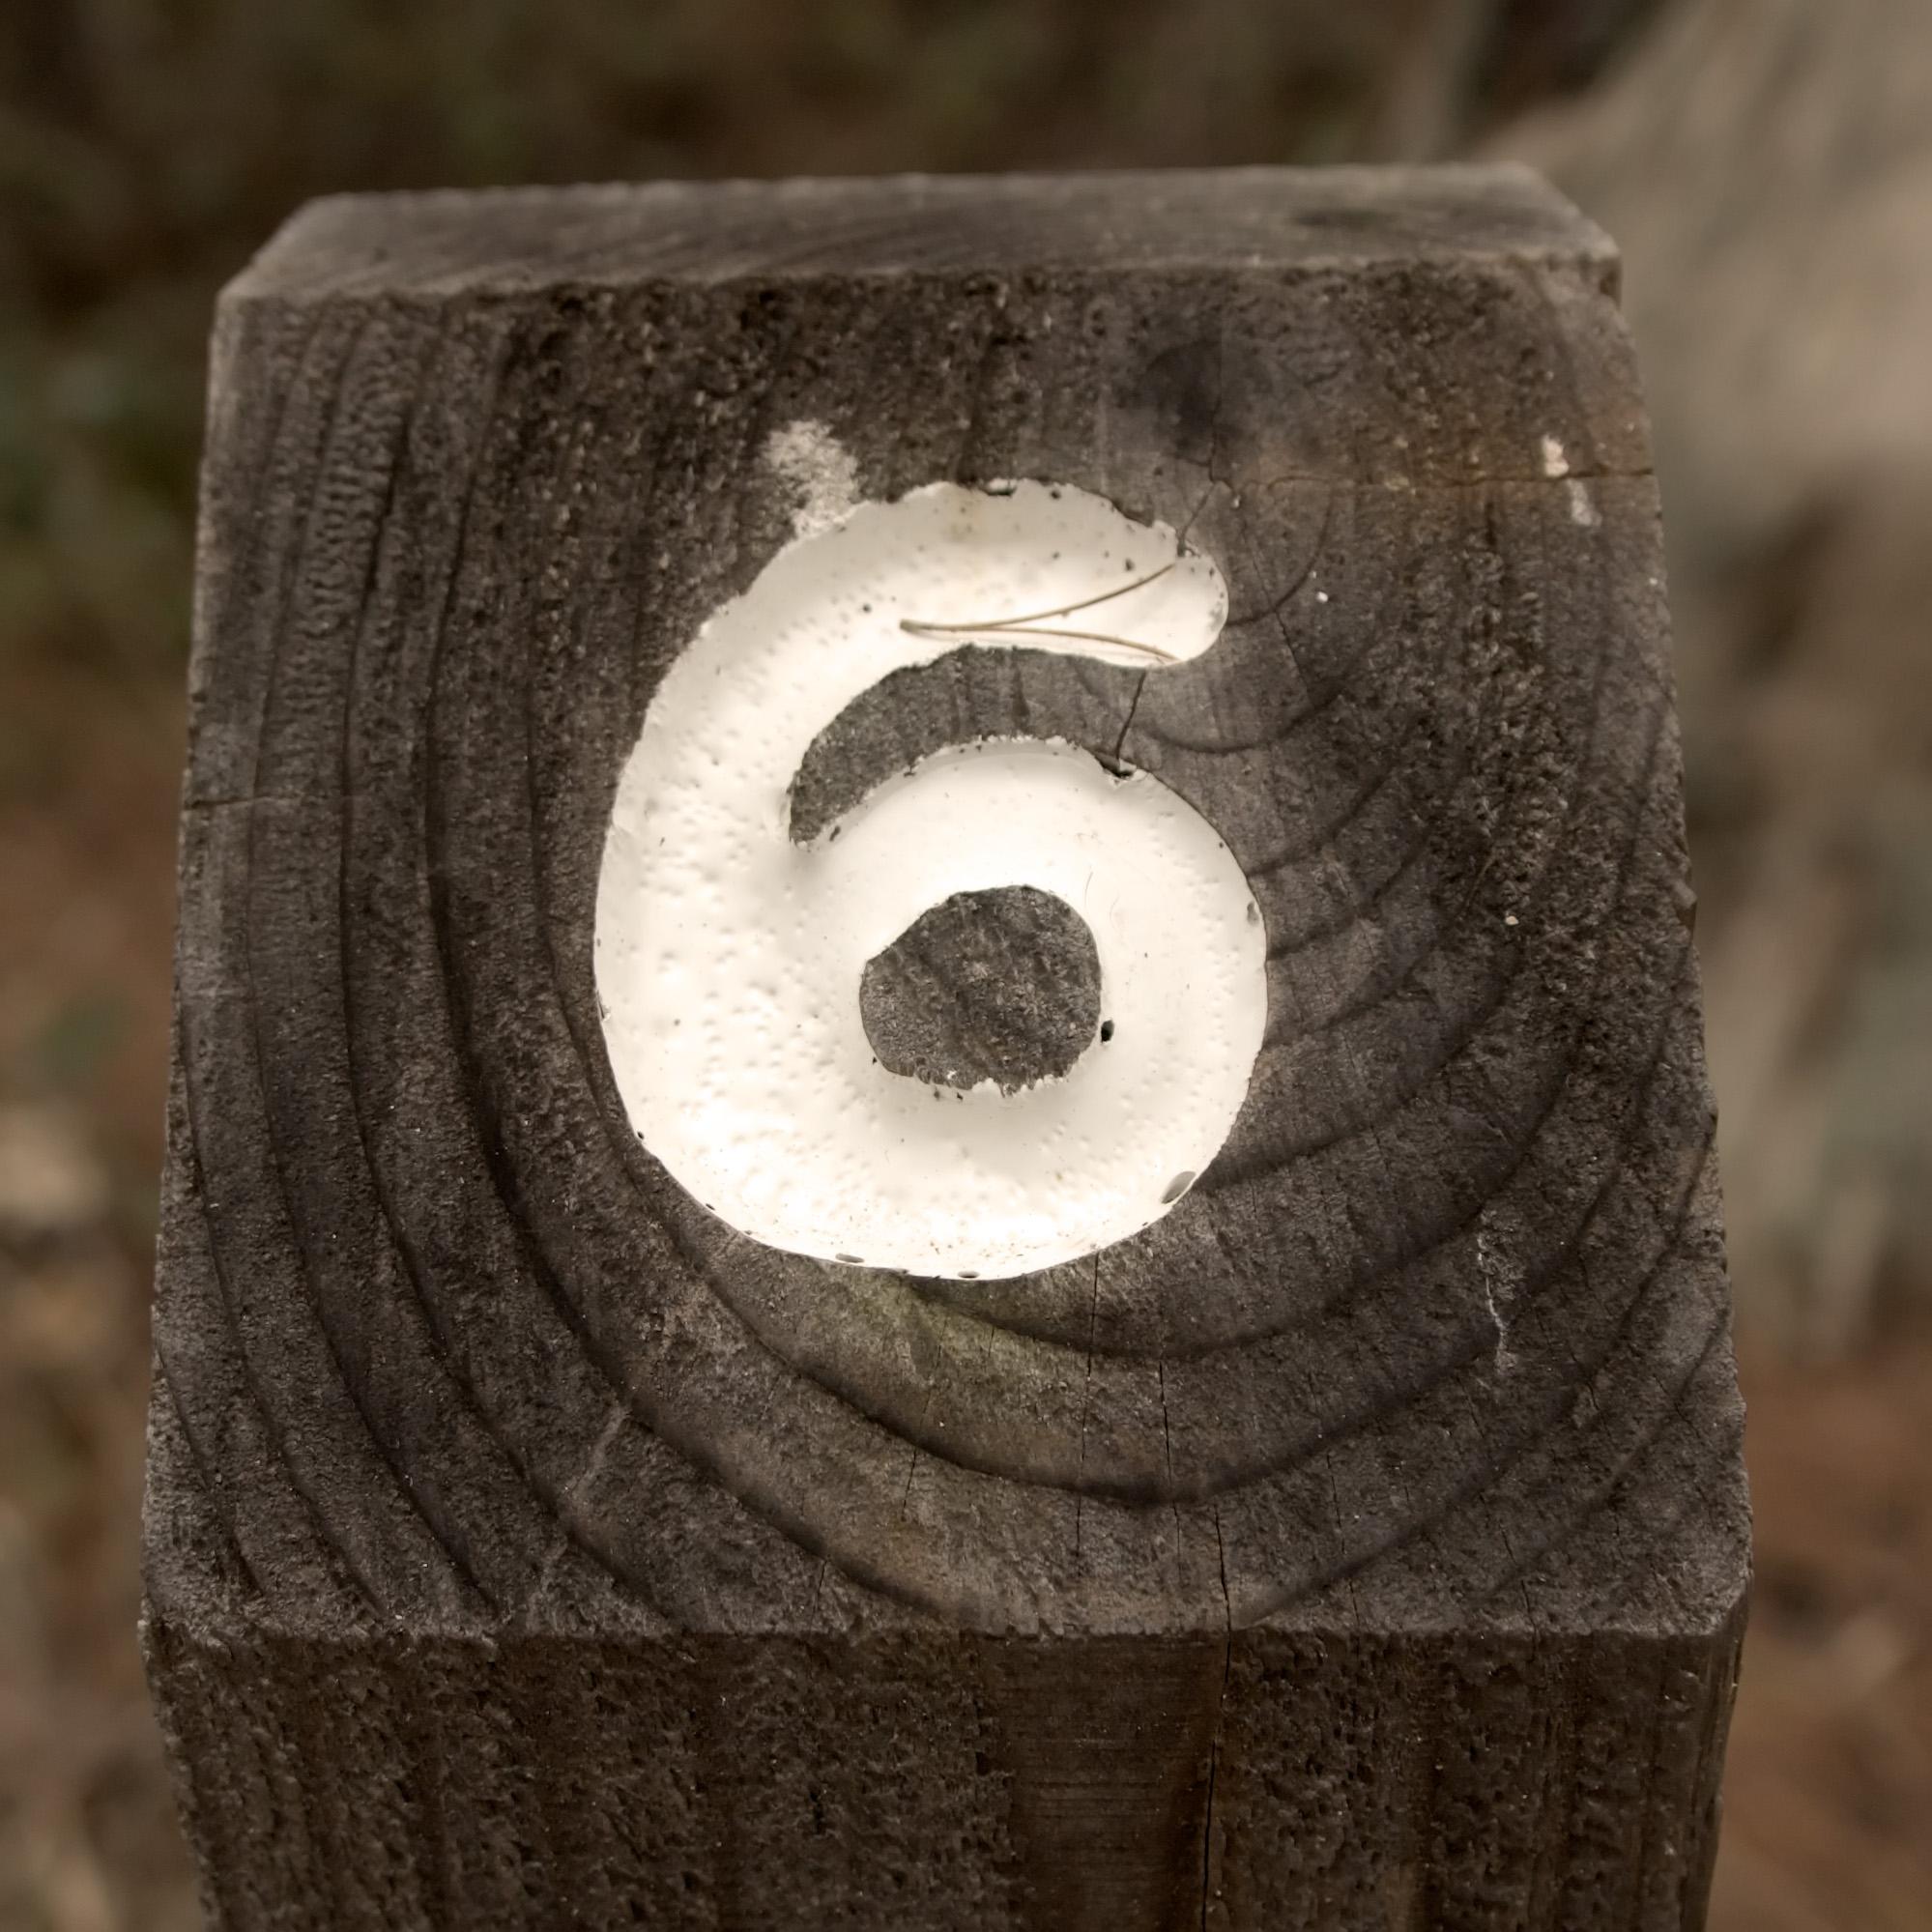 https://i2.wp.com/upload.wikimedia.org/wikipedia/commons/1/14/Nature%27s_Number_6.jpg